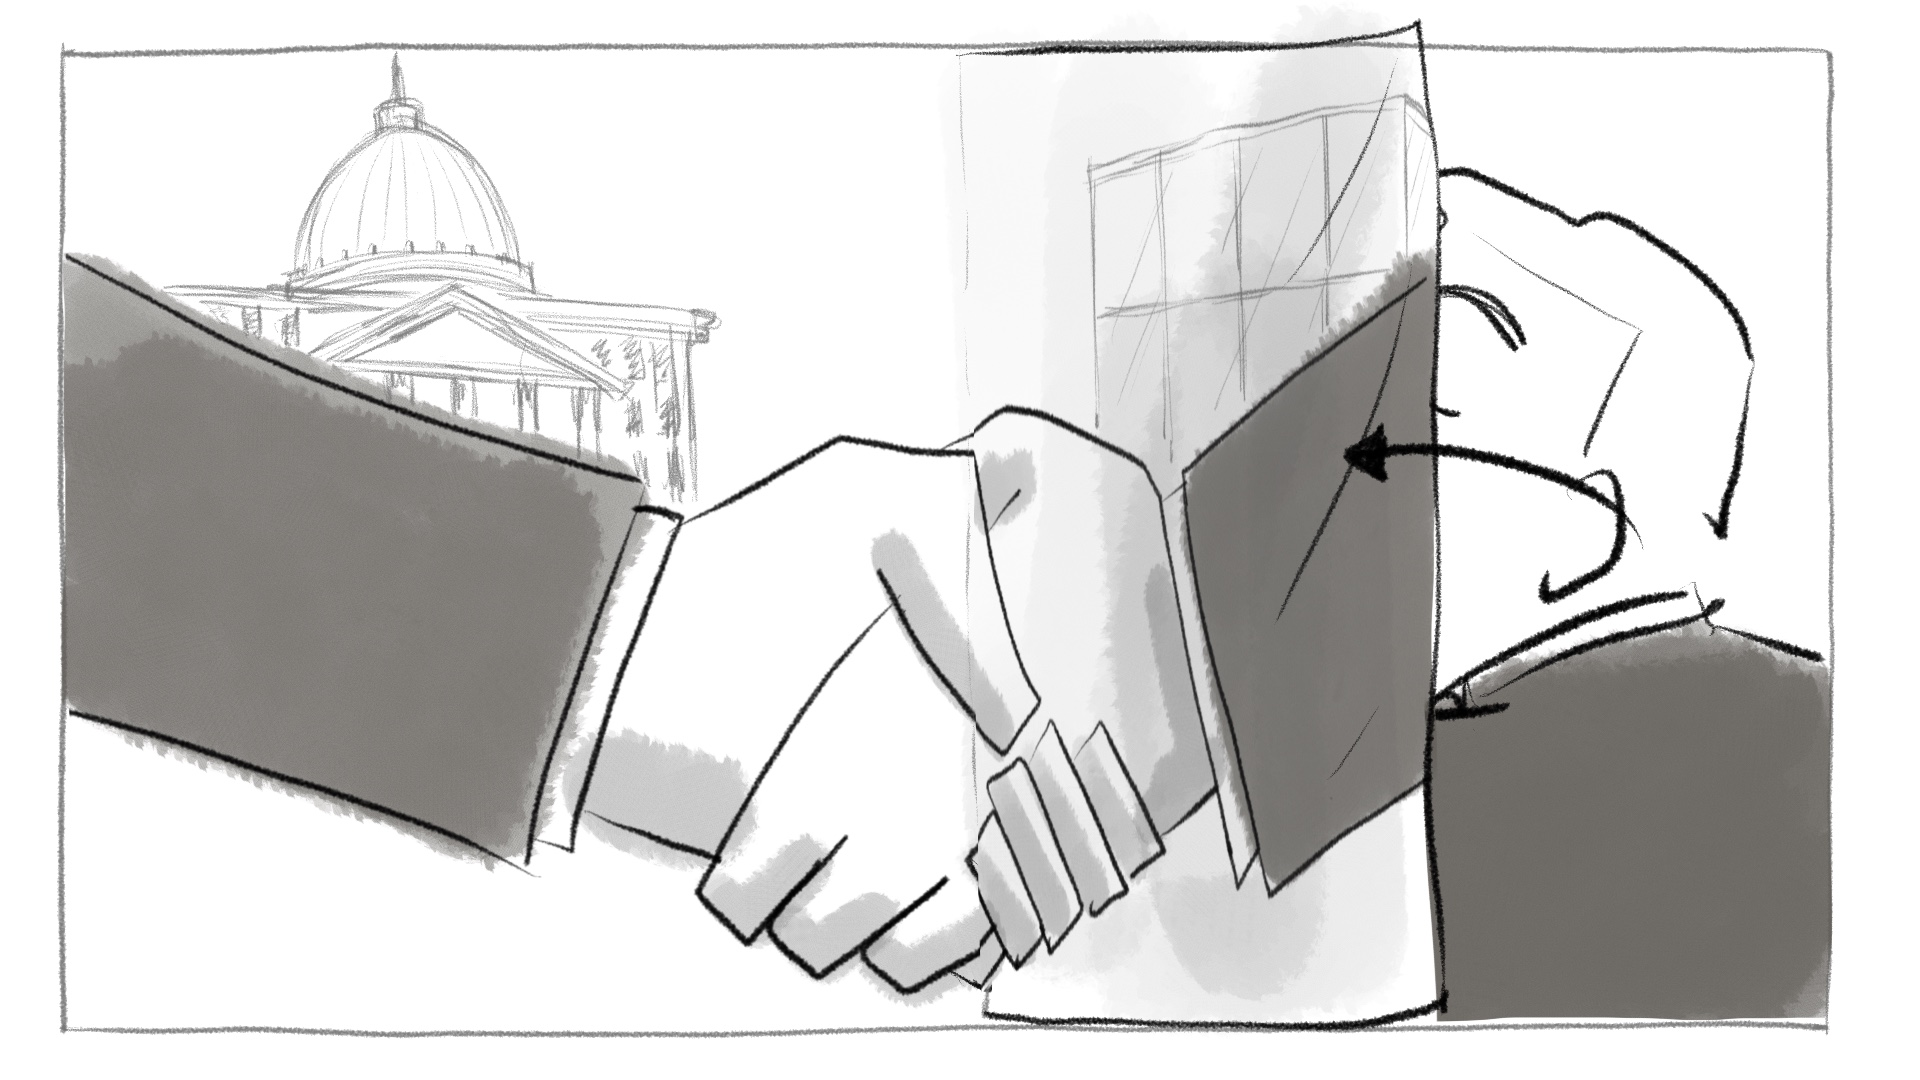 Shahidi_Storyboards_4c-3.jpg